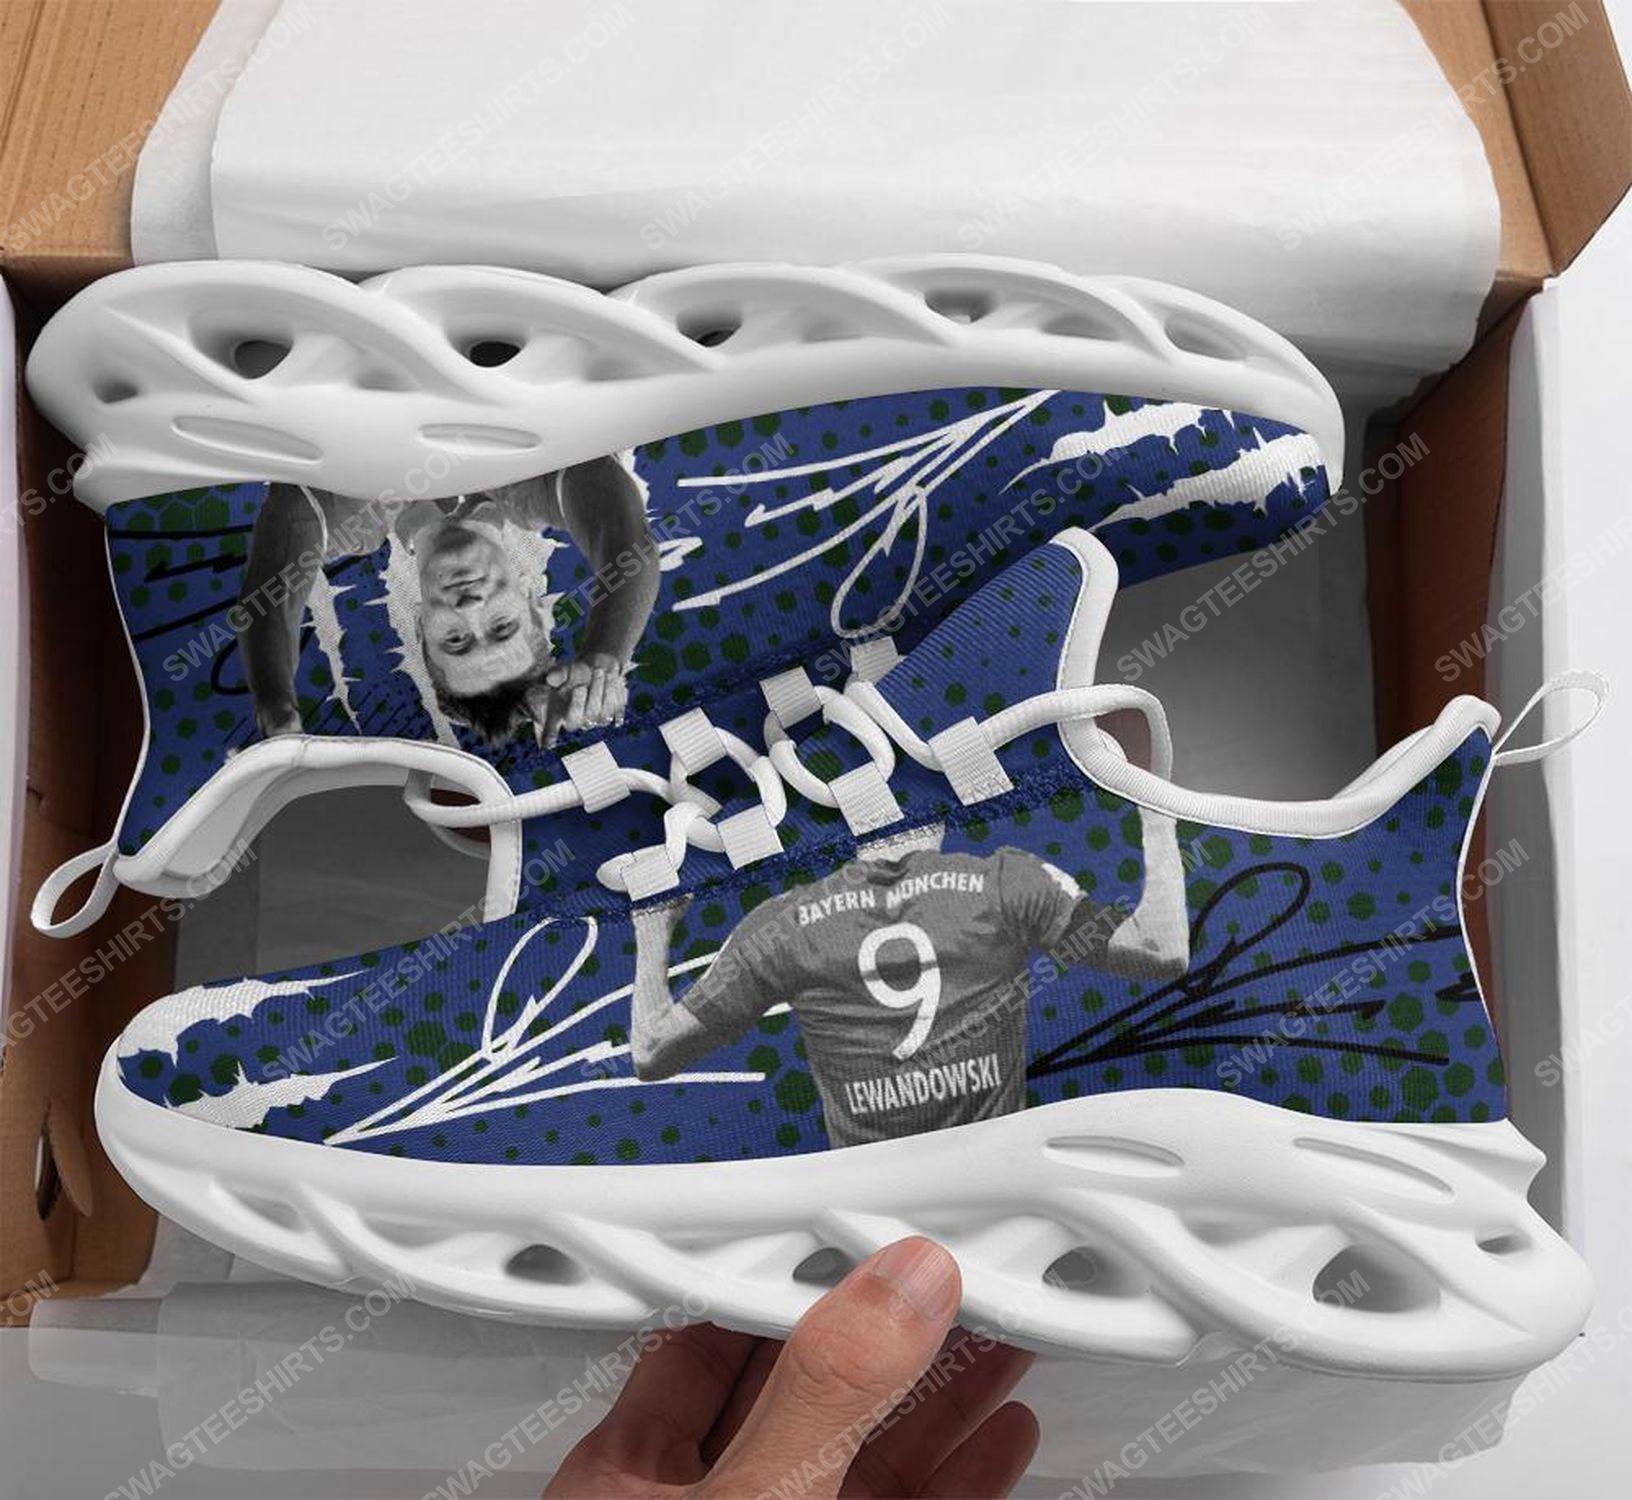 Robert lewandowski bayern munich football club max soul shoes 1 - Copy (2)